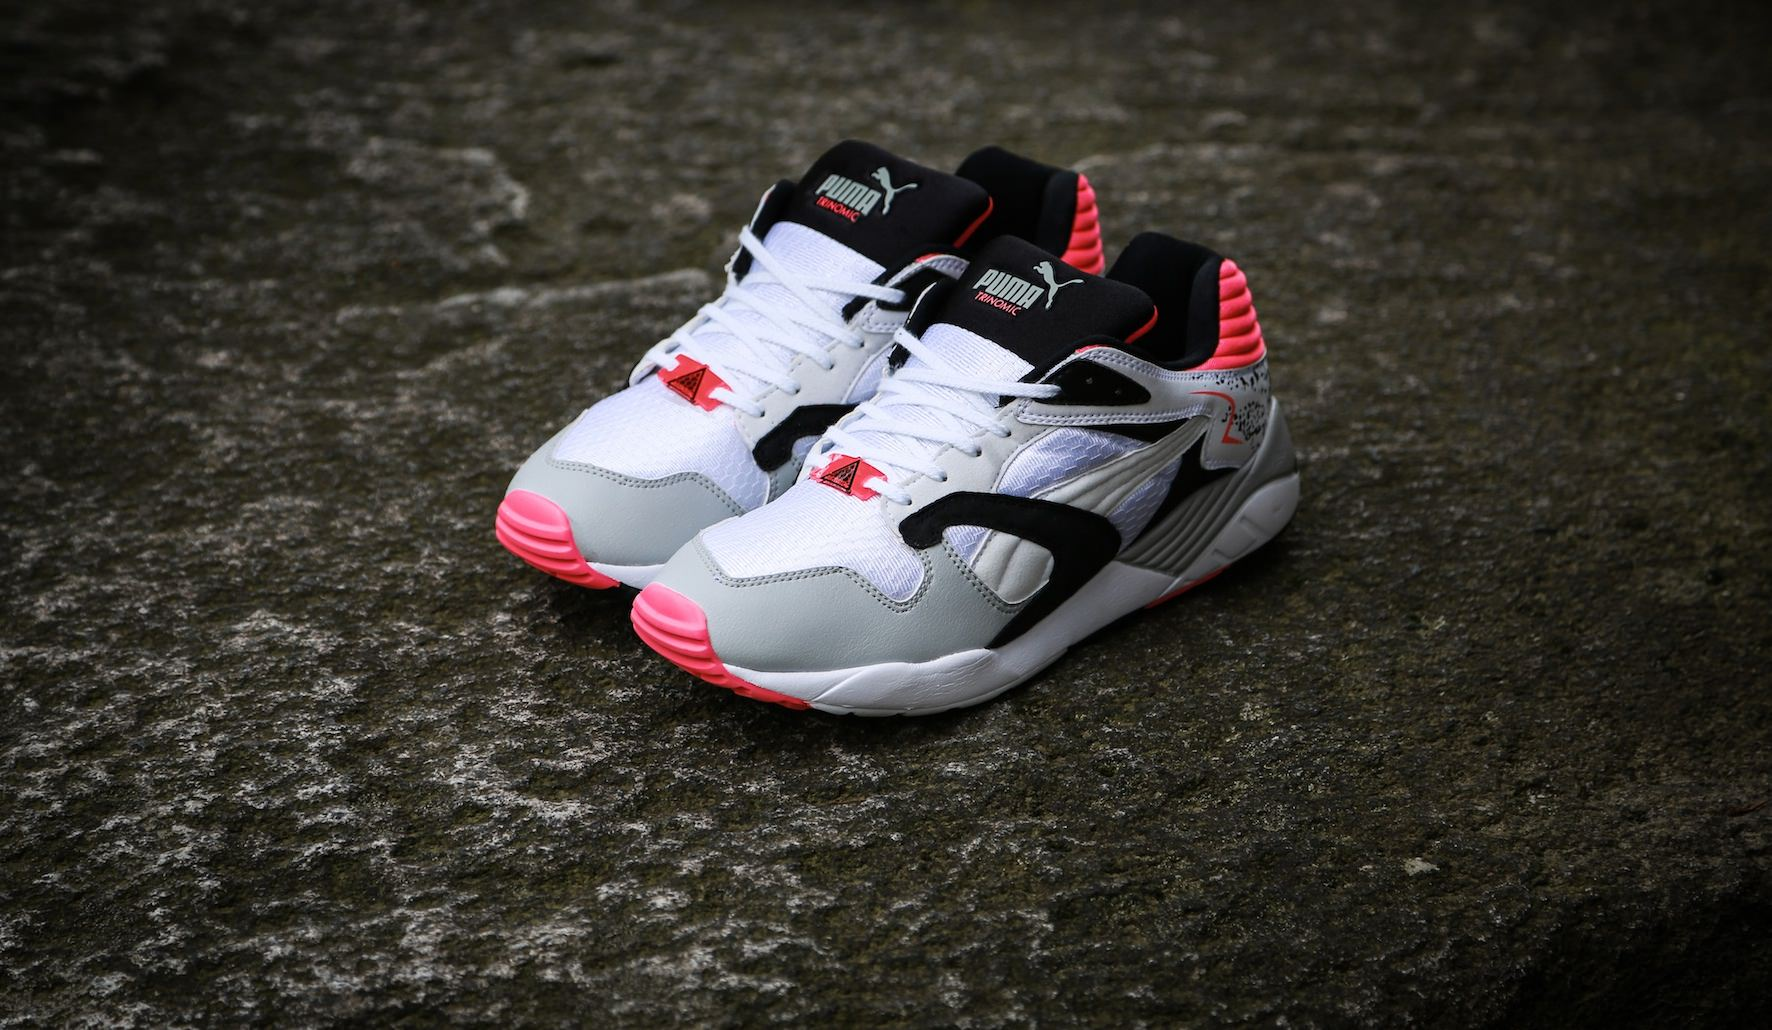 Puma relauncht legendären 90s Sneaker XS850 OG Blog übers